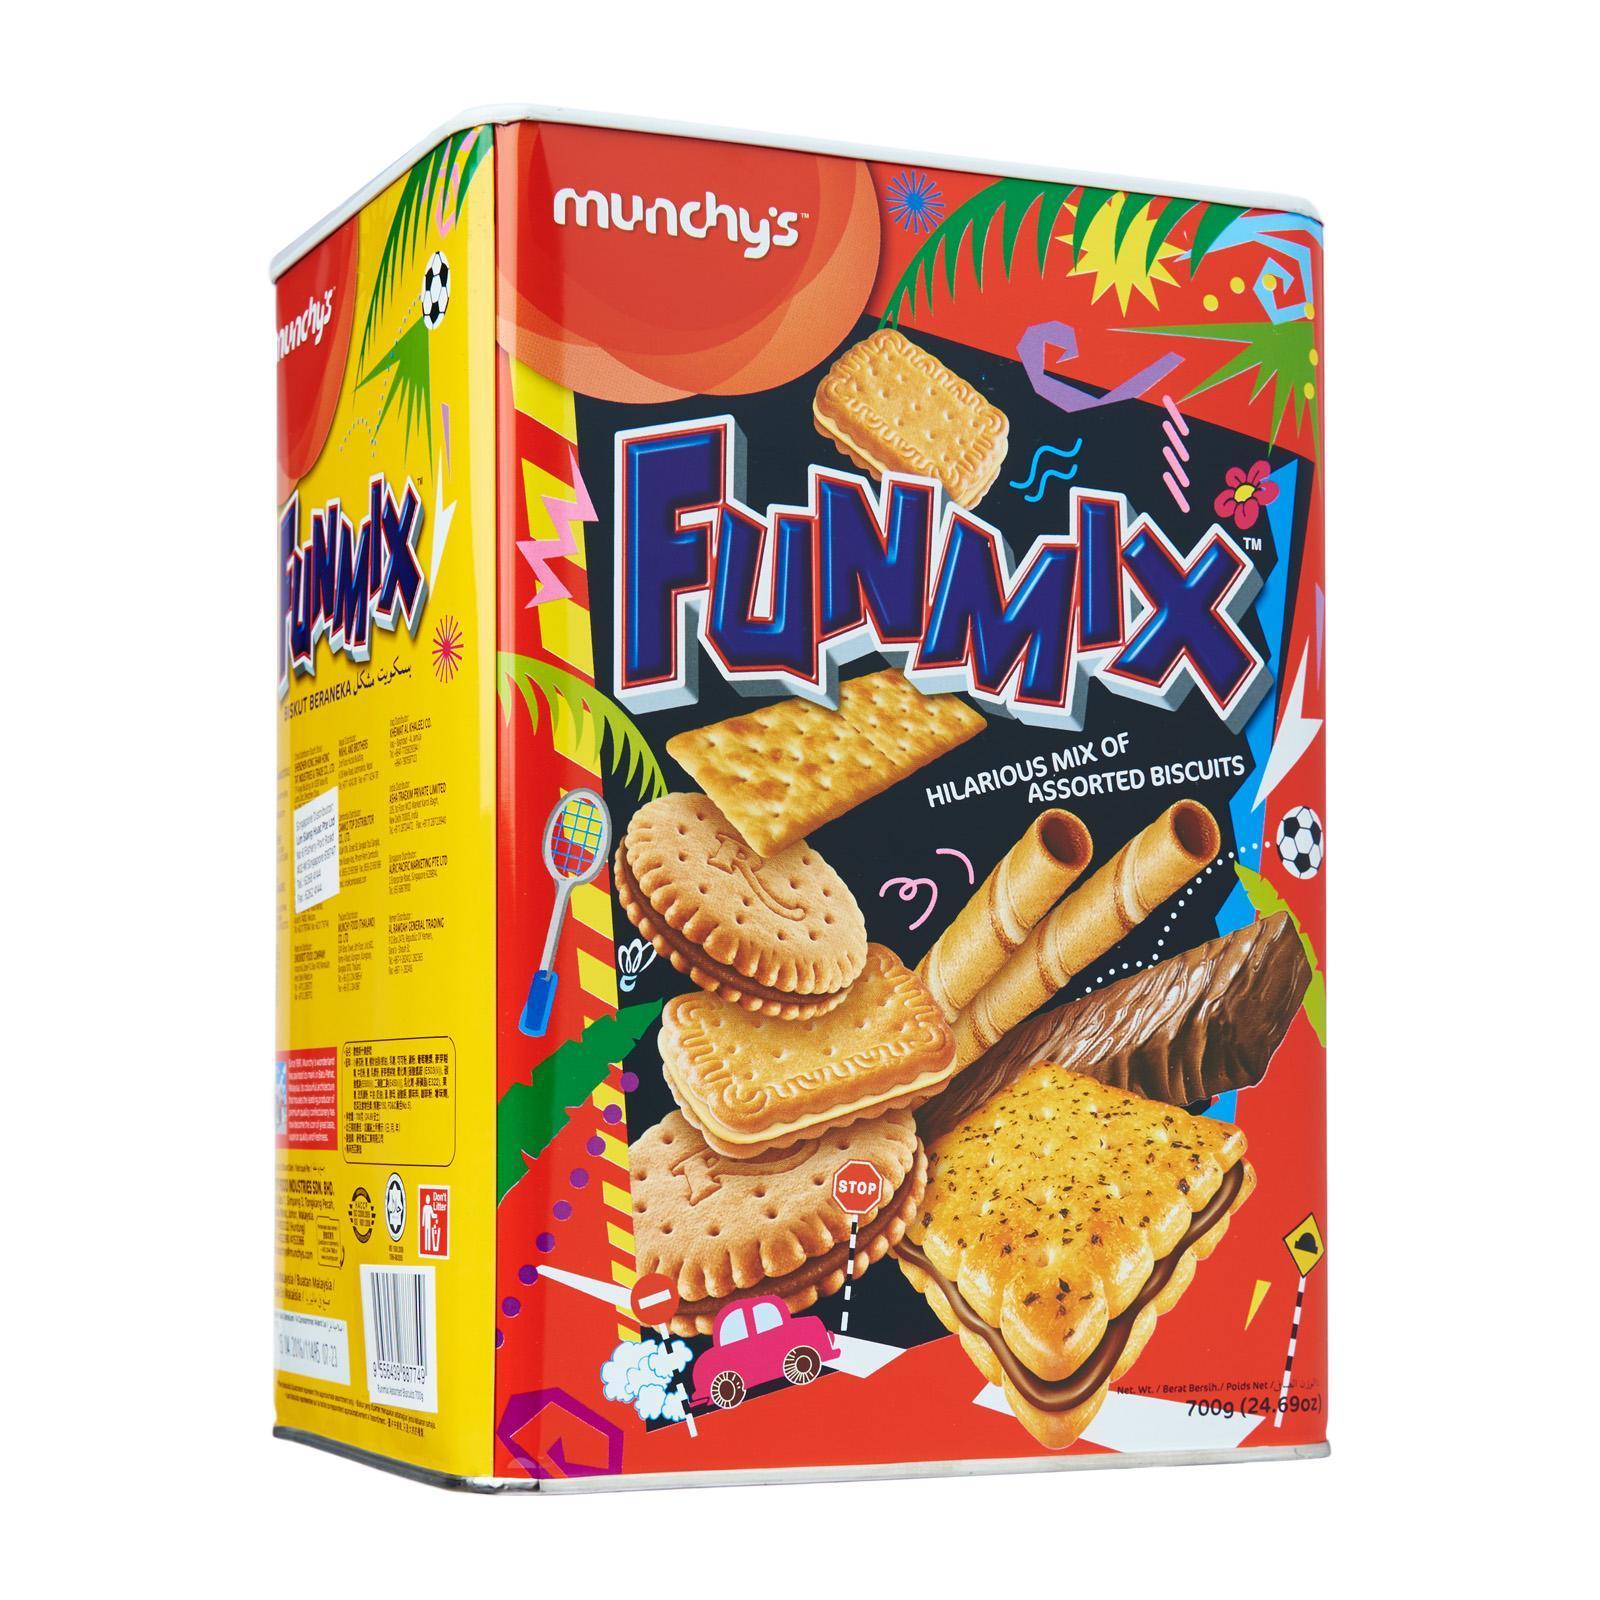 MUNCHY'S Funmix Assorted Biscuits 700g